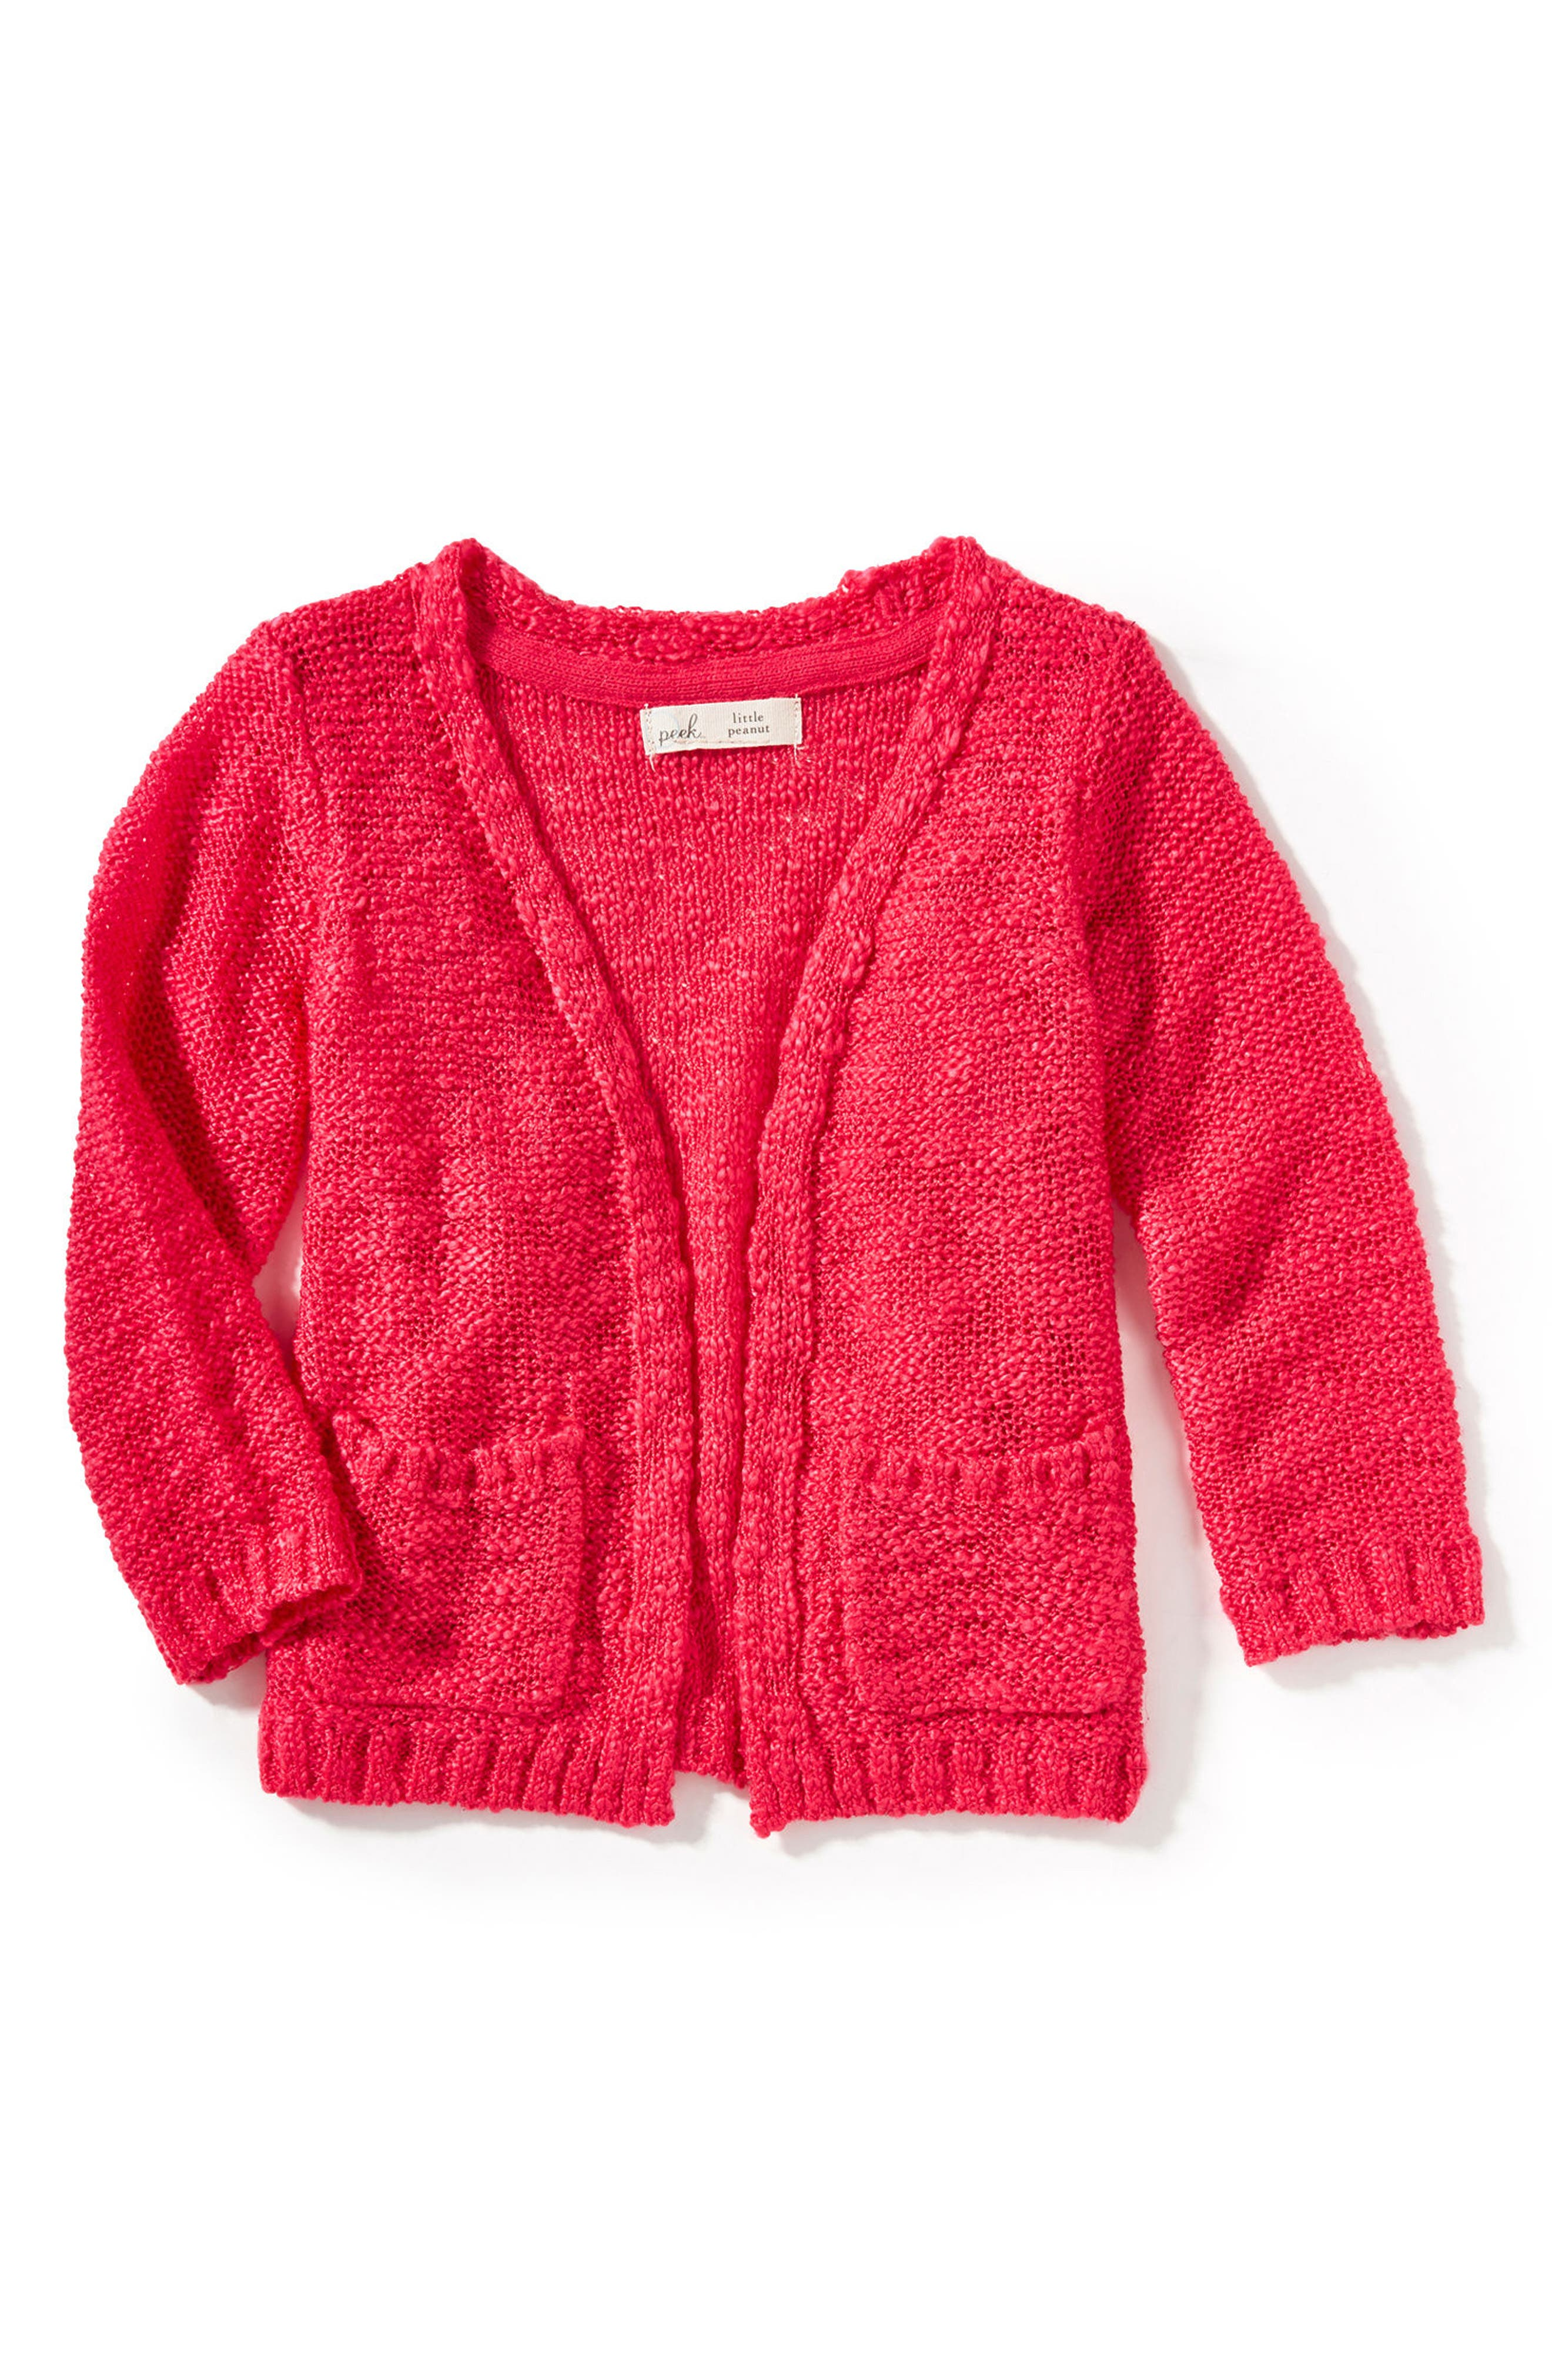 Cecile Cardigan,                             Main thumbnail 1, color,                             Hot Pink